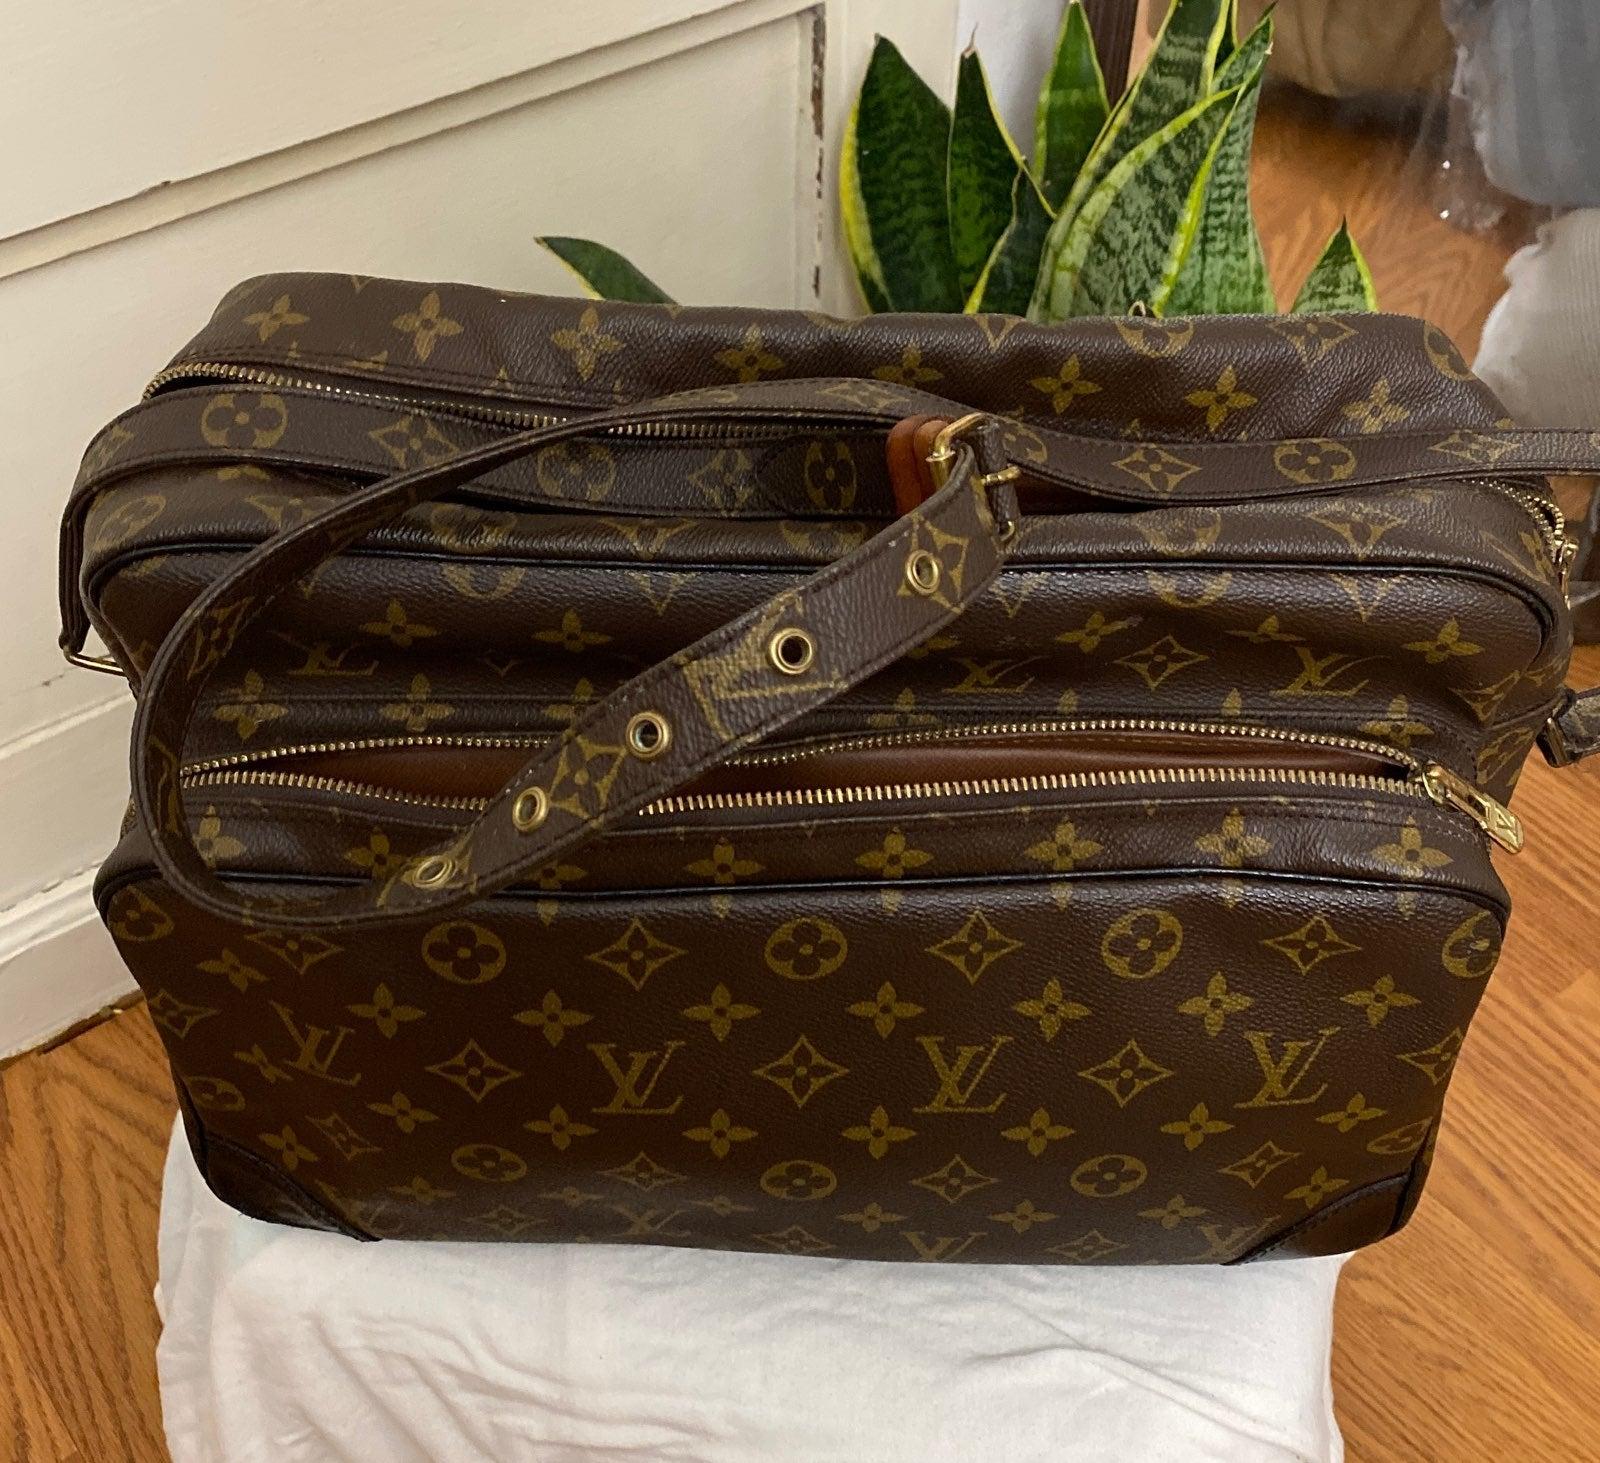 Louis Vuitton nile gm